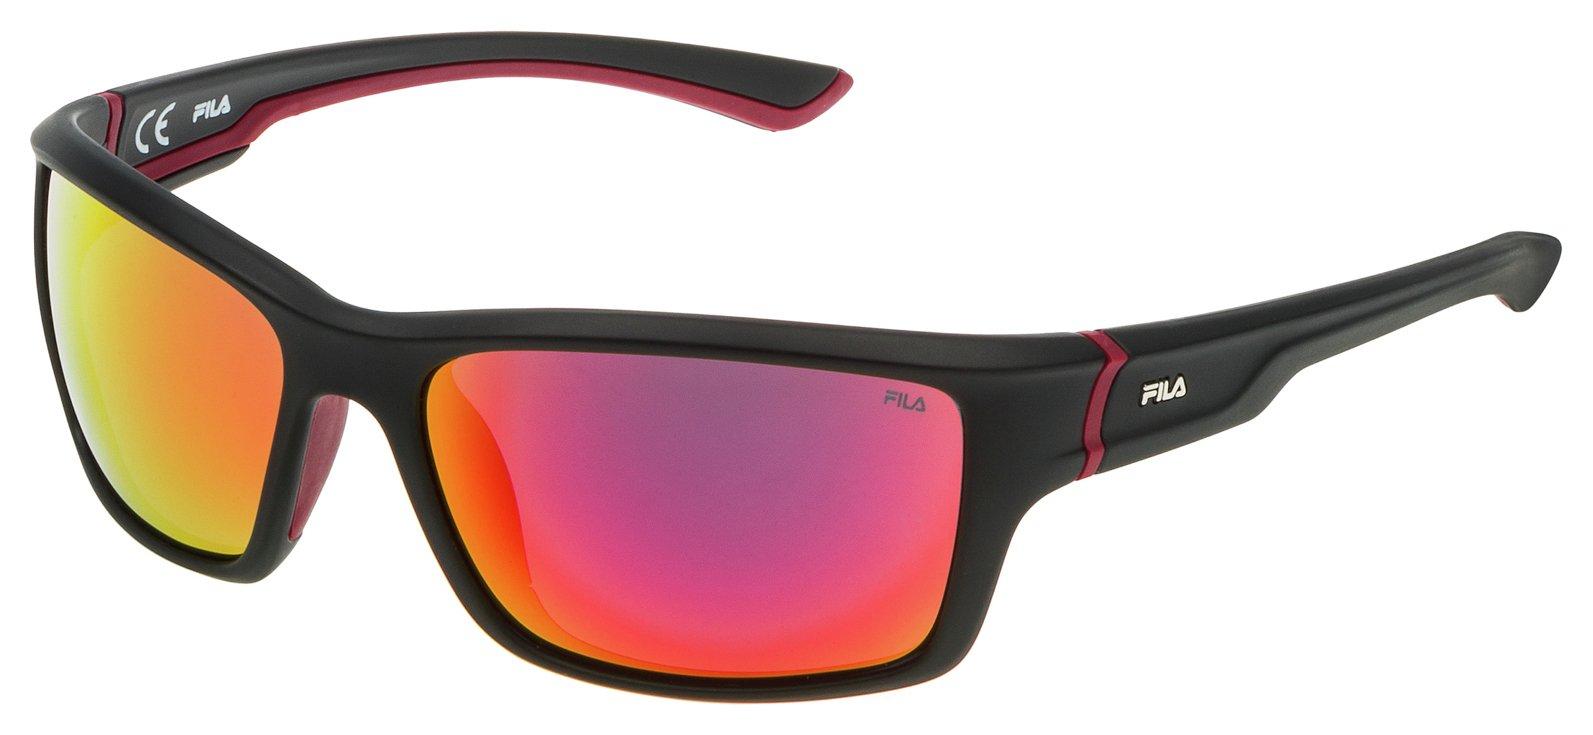 Image of Fila Matt Black Sunglasses.